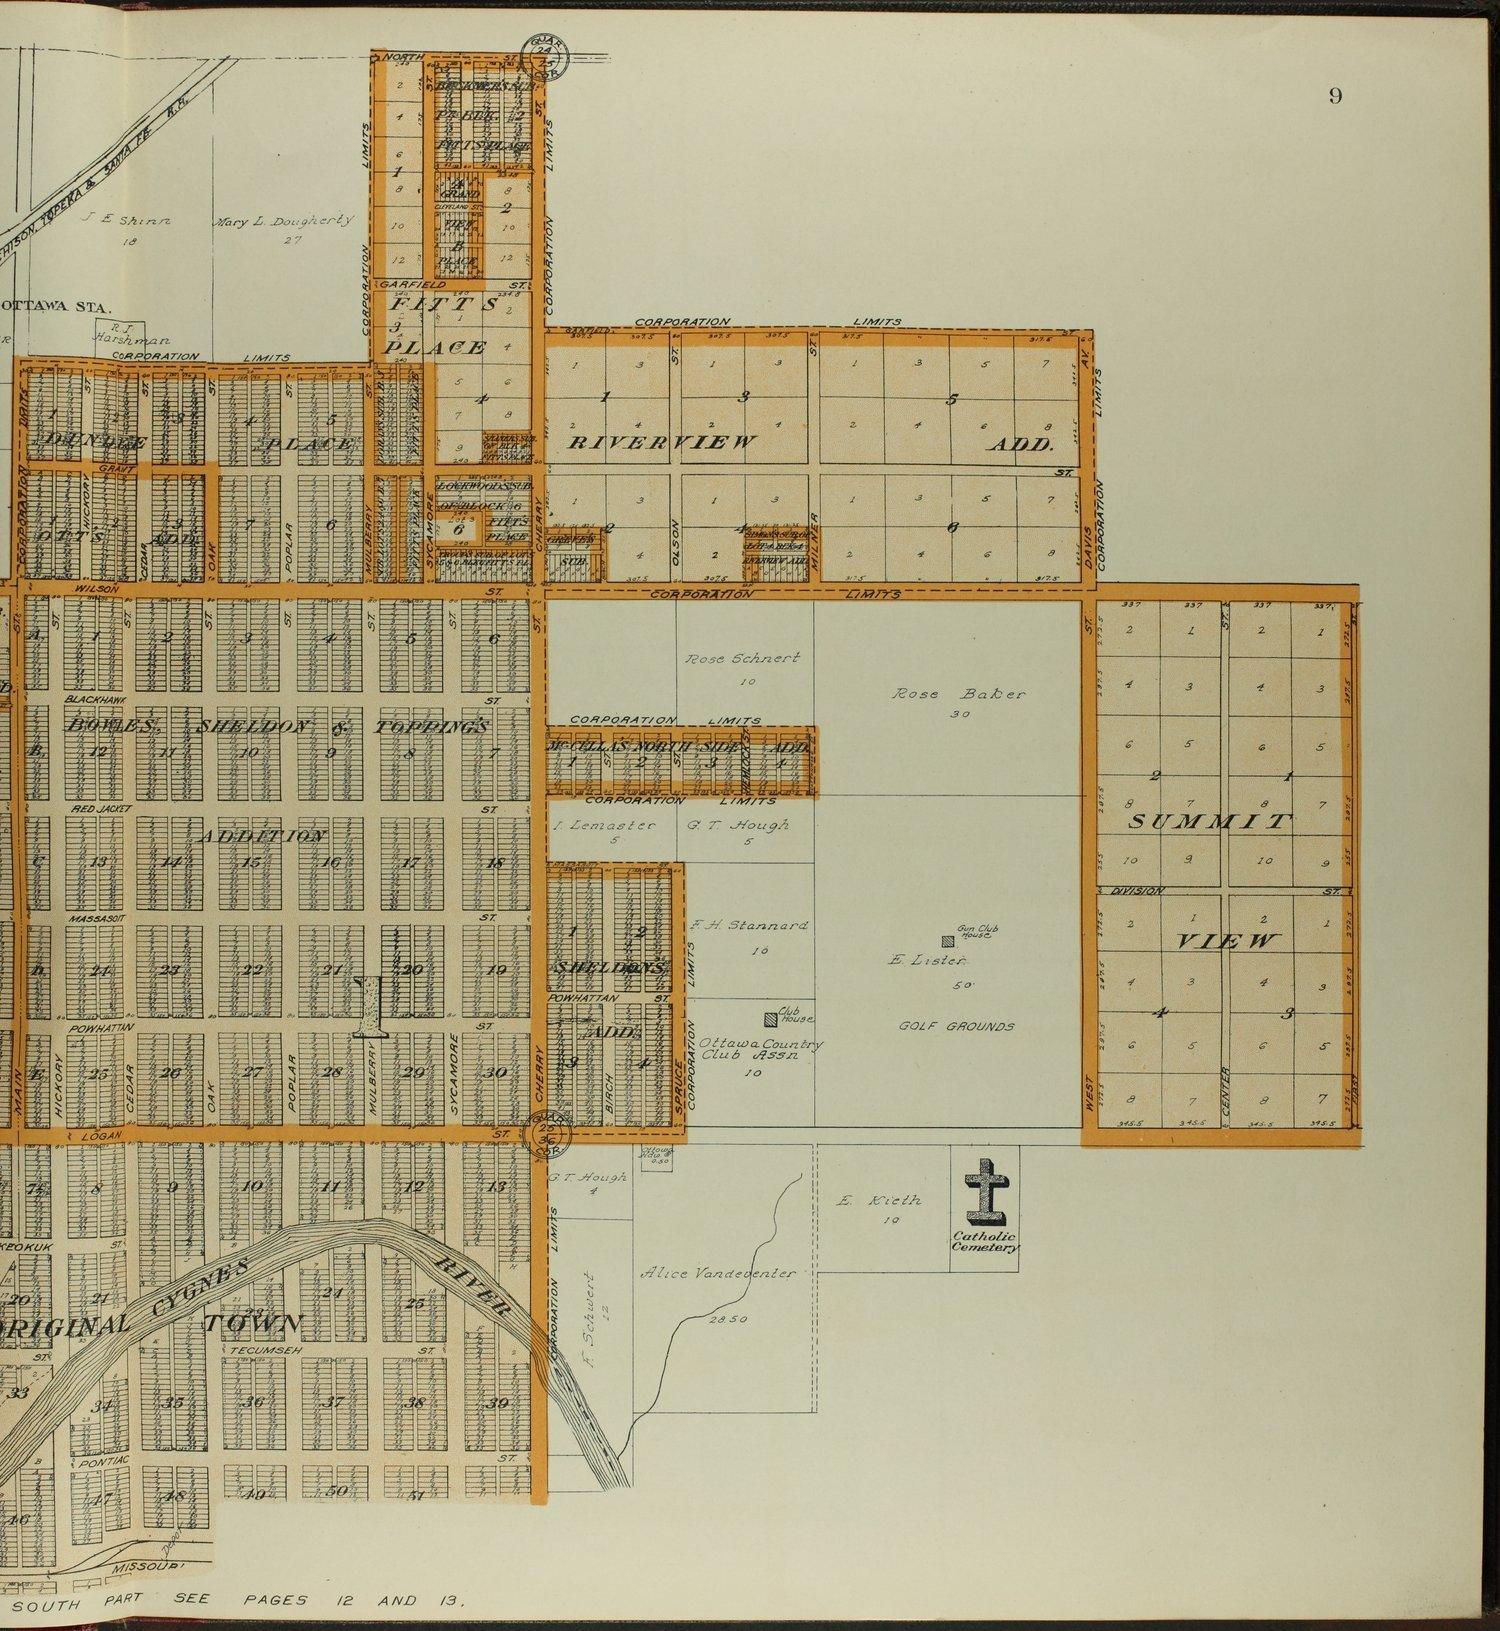 Standard atlas of Franklin County, Kansas - 9